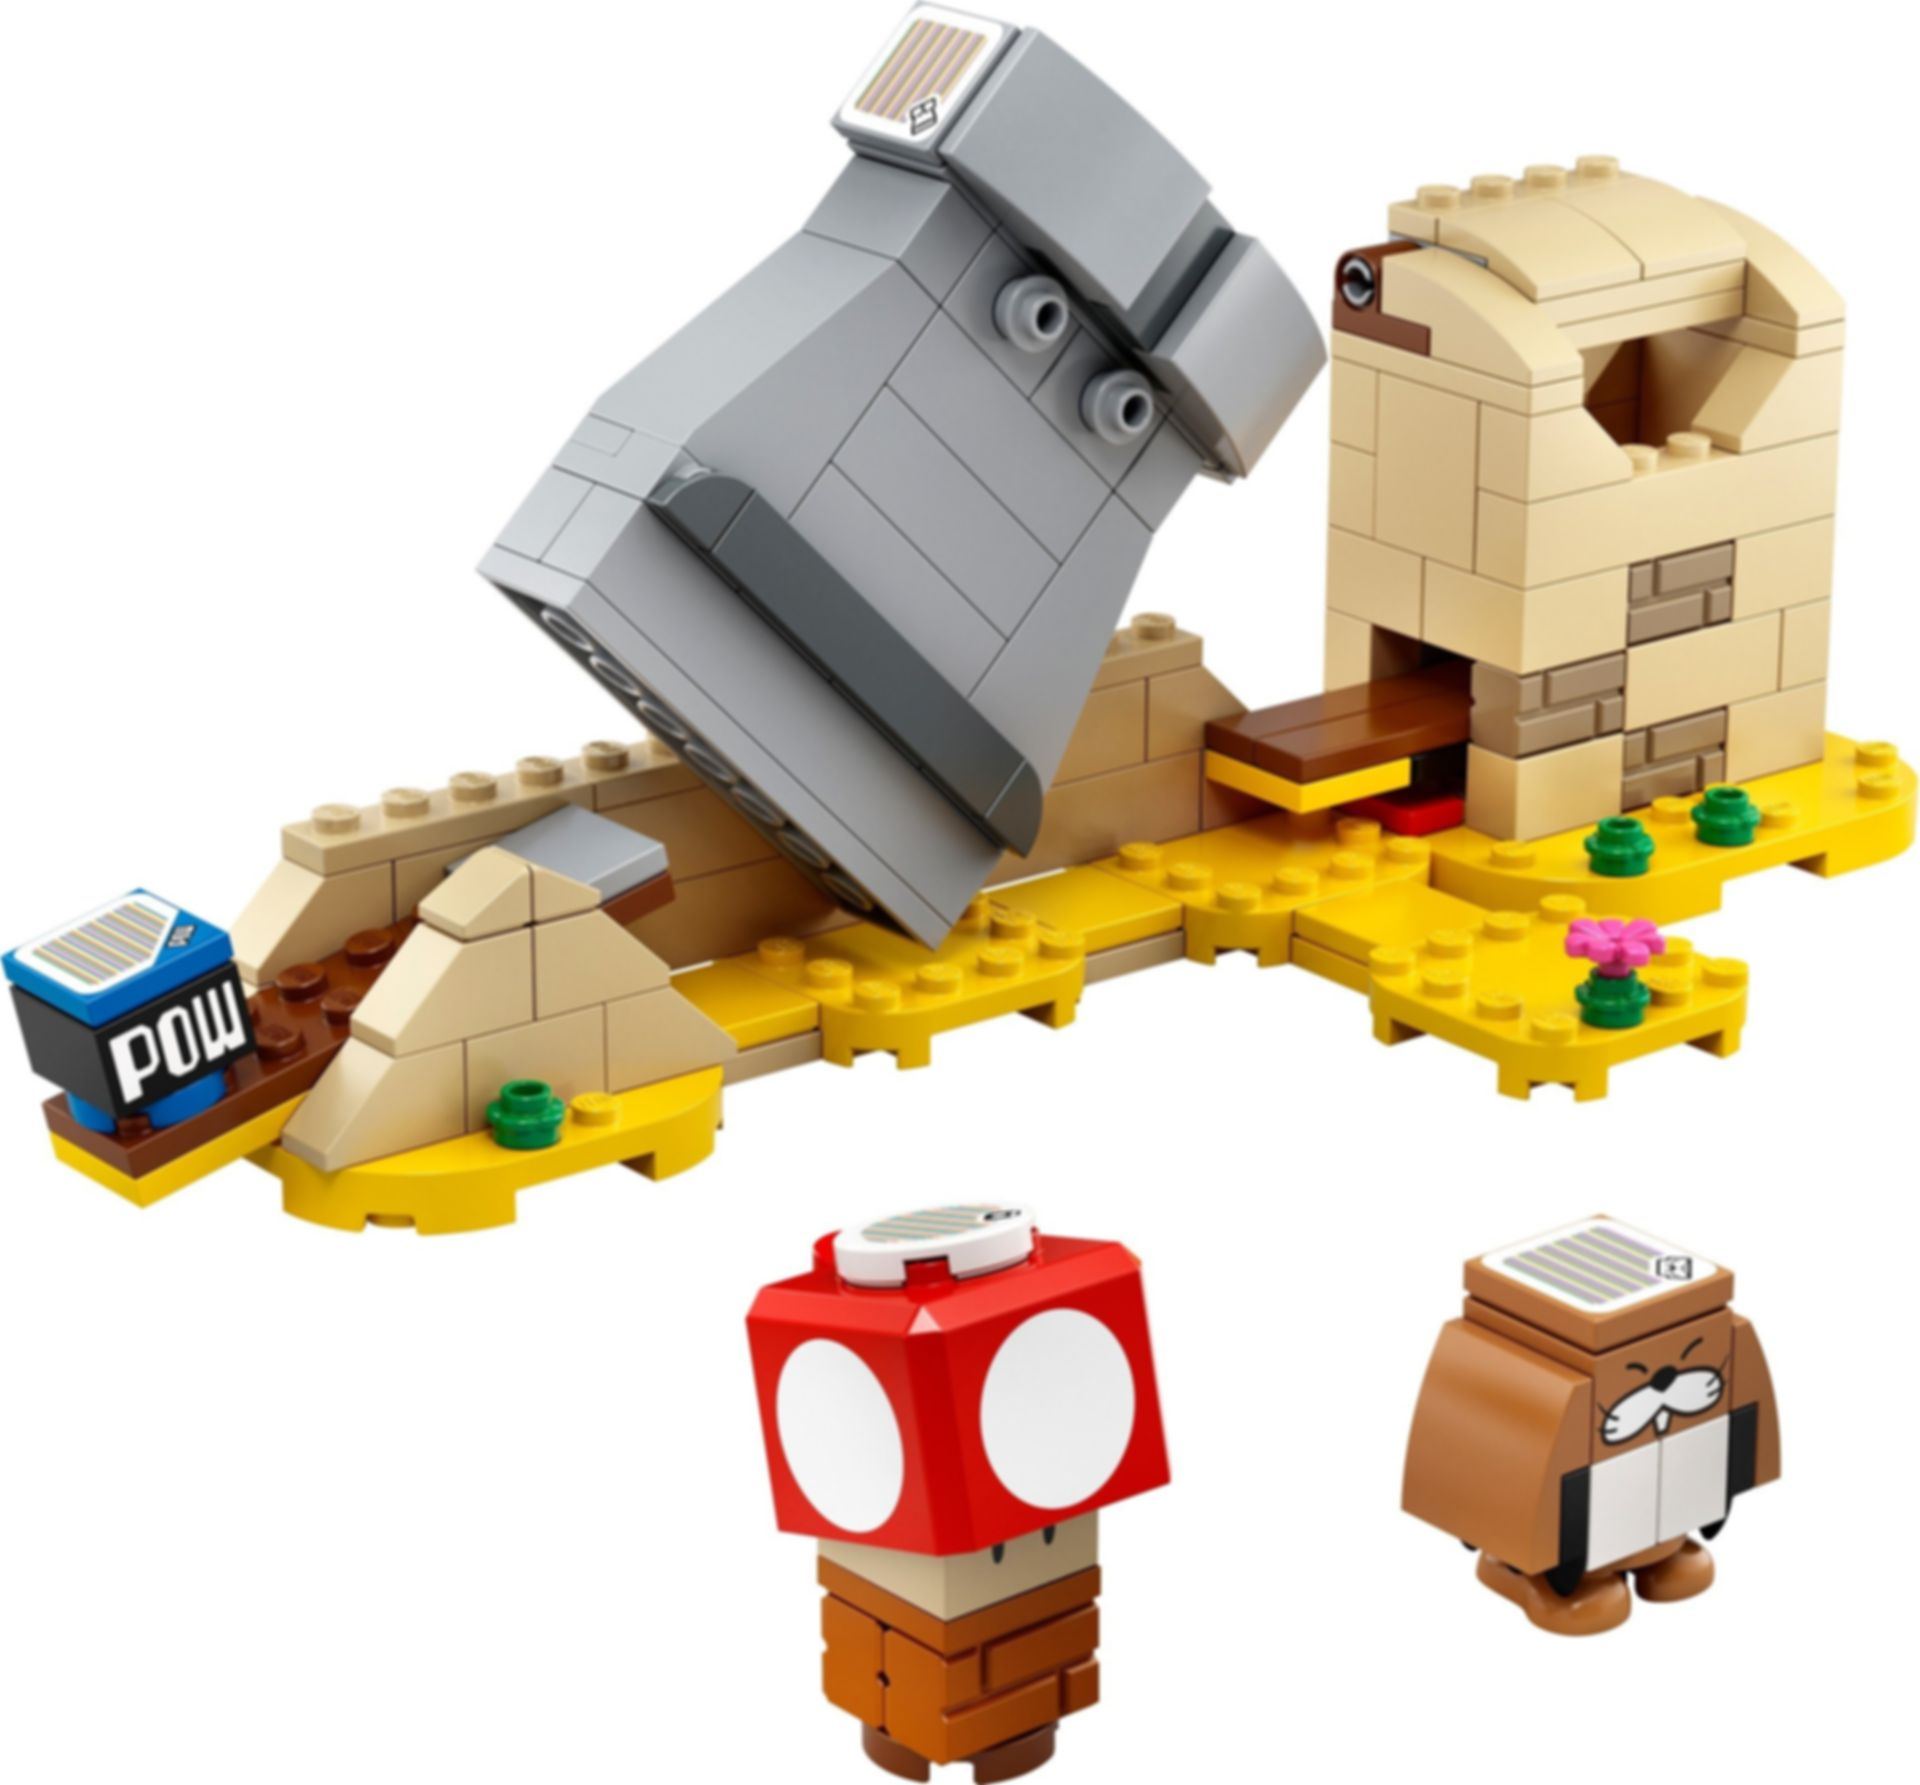 LEGO® Super Mario™ Monty Mole & Super Mushroom components